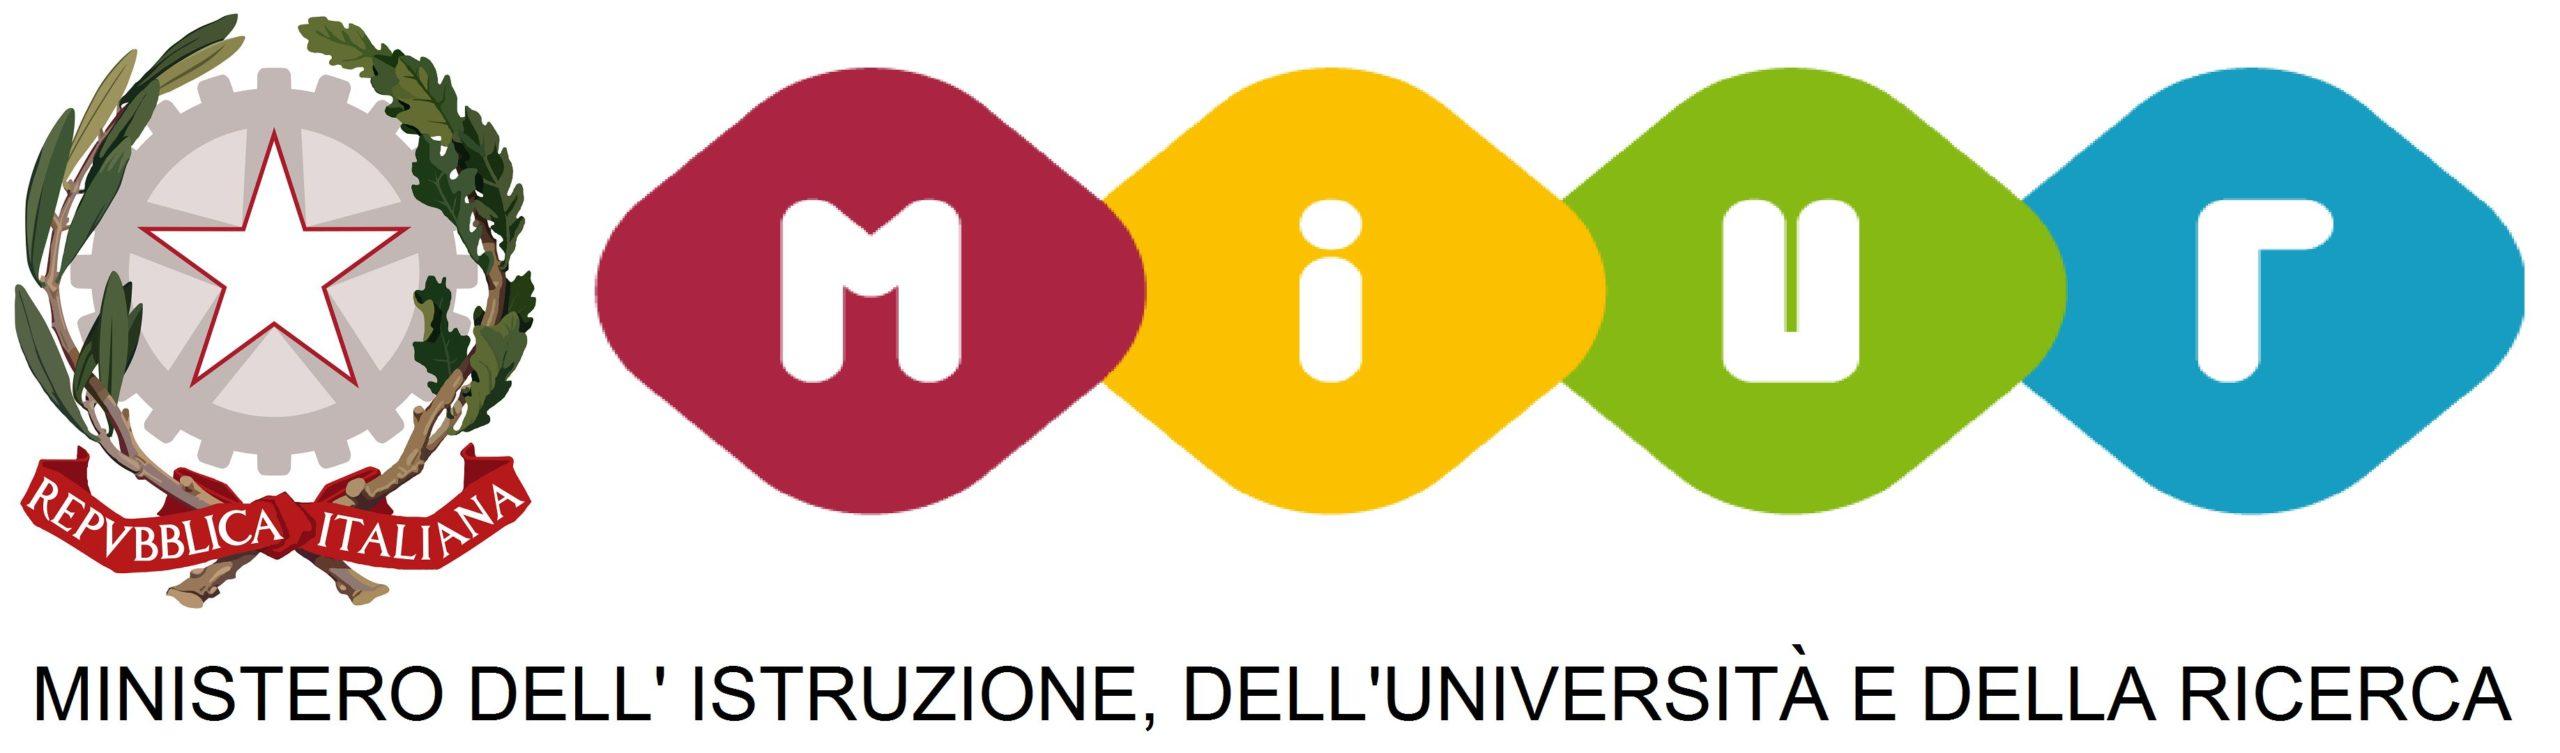 Certificazioni ECDL online